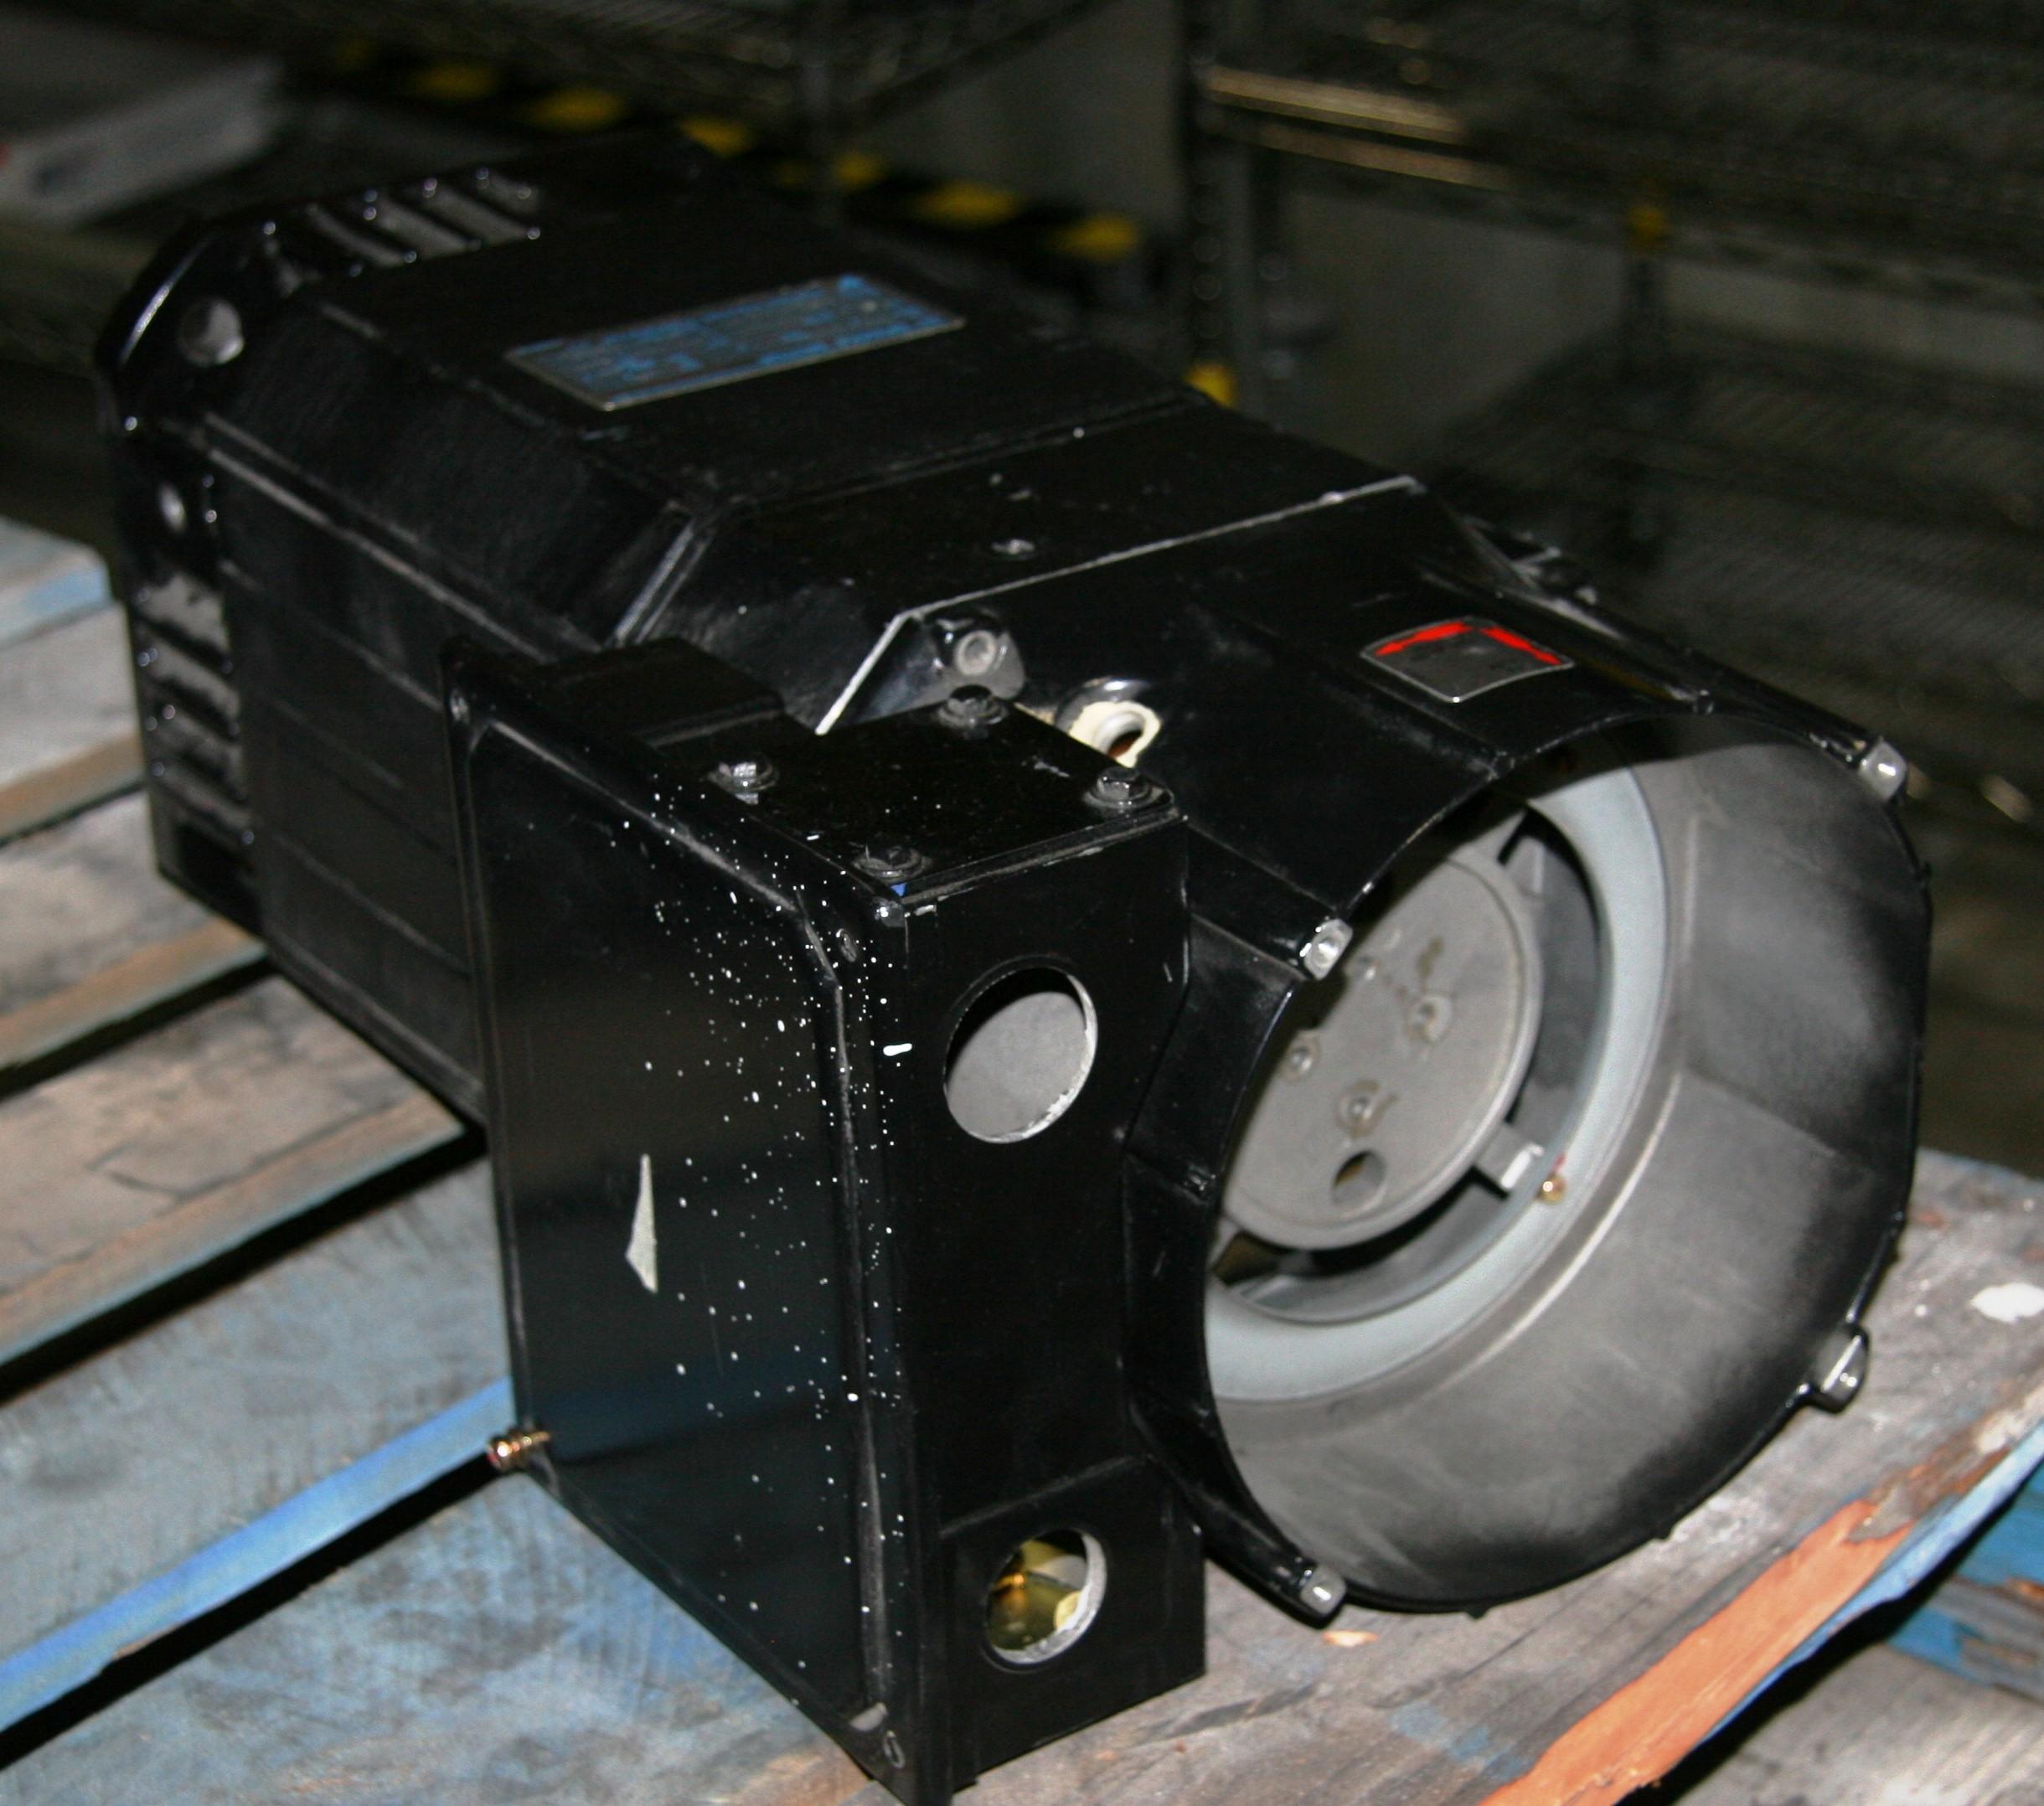 1) Used Yaskawa Electric Corp  UAASKA-11LYA31 AC Spindle